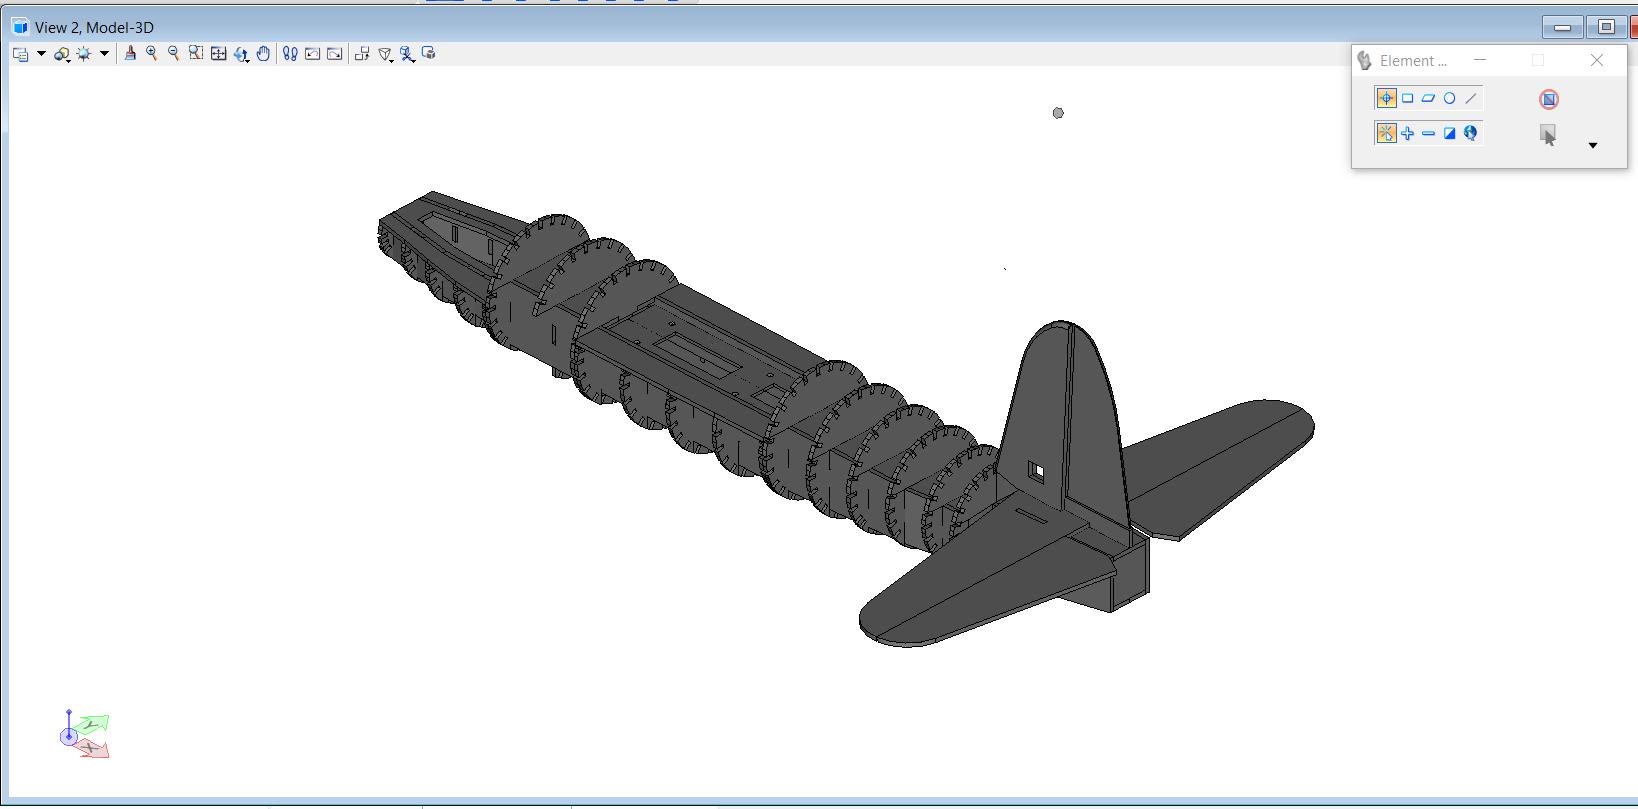 Martin B 26 Marauder Plans And 3d Model Coming Soon Flitetest Forum Engine Diagram 6